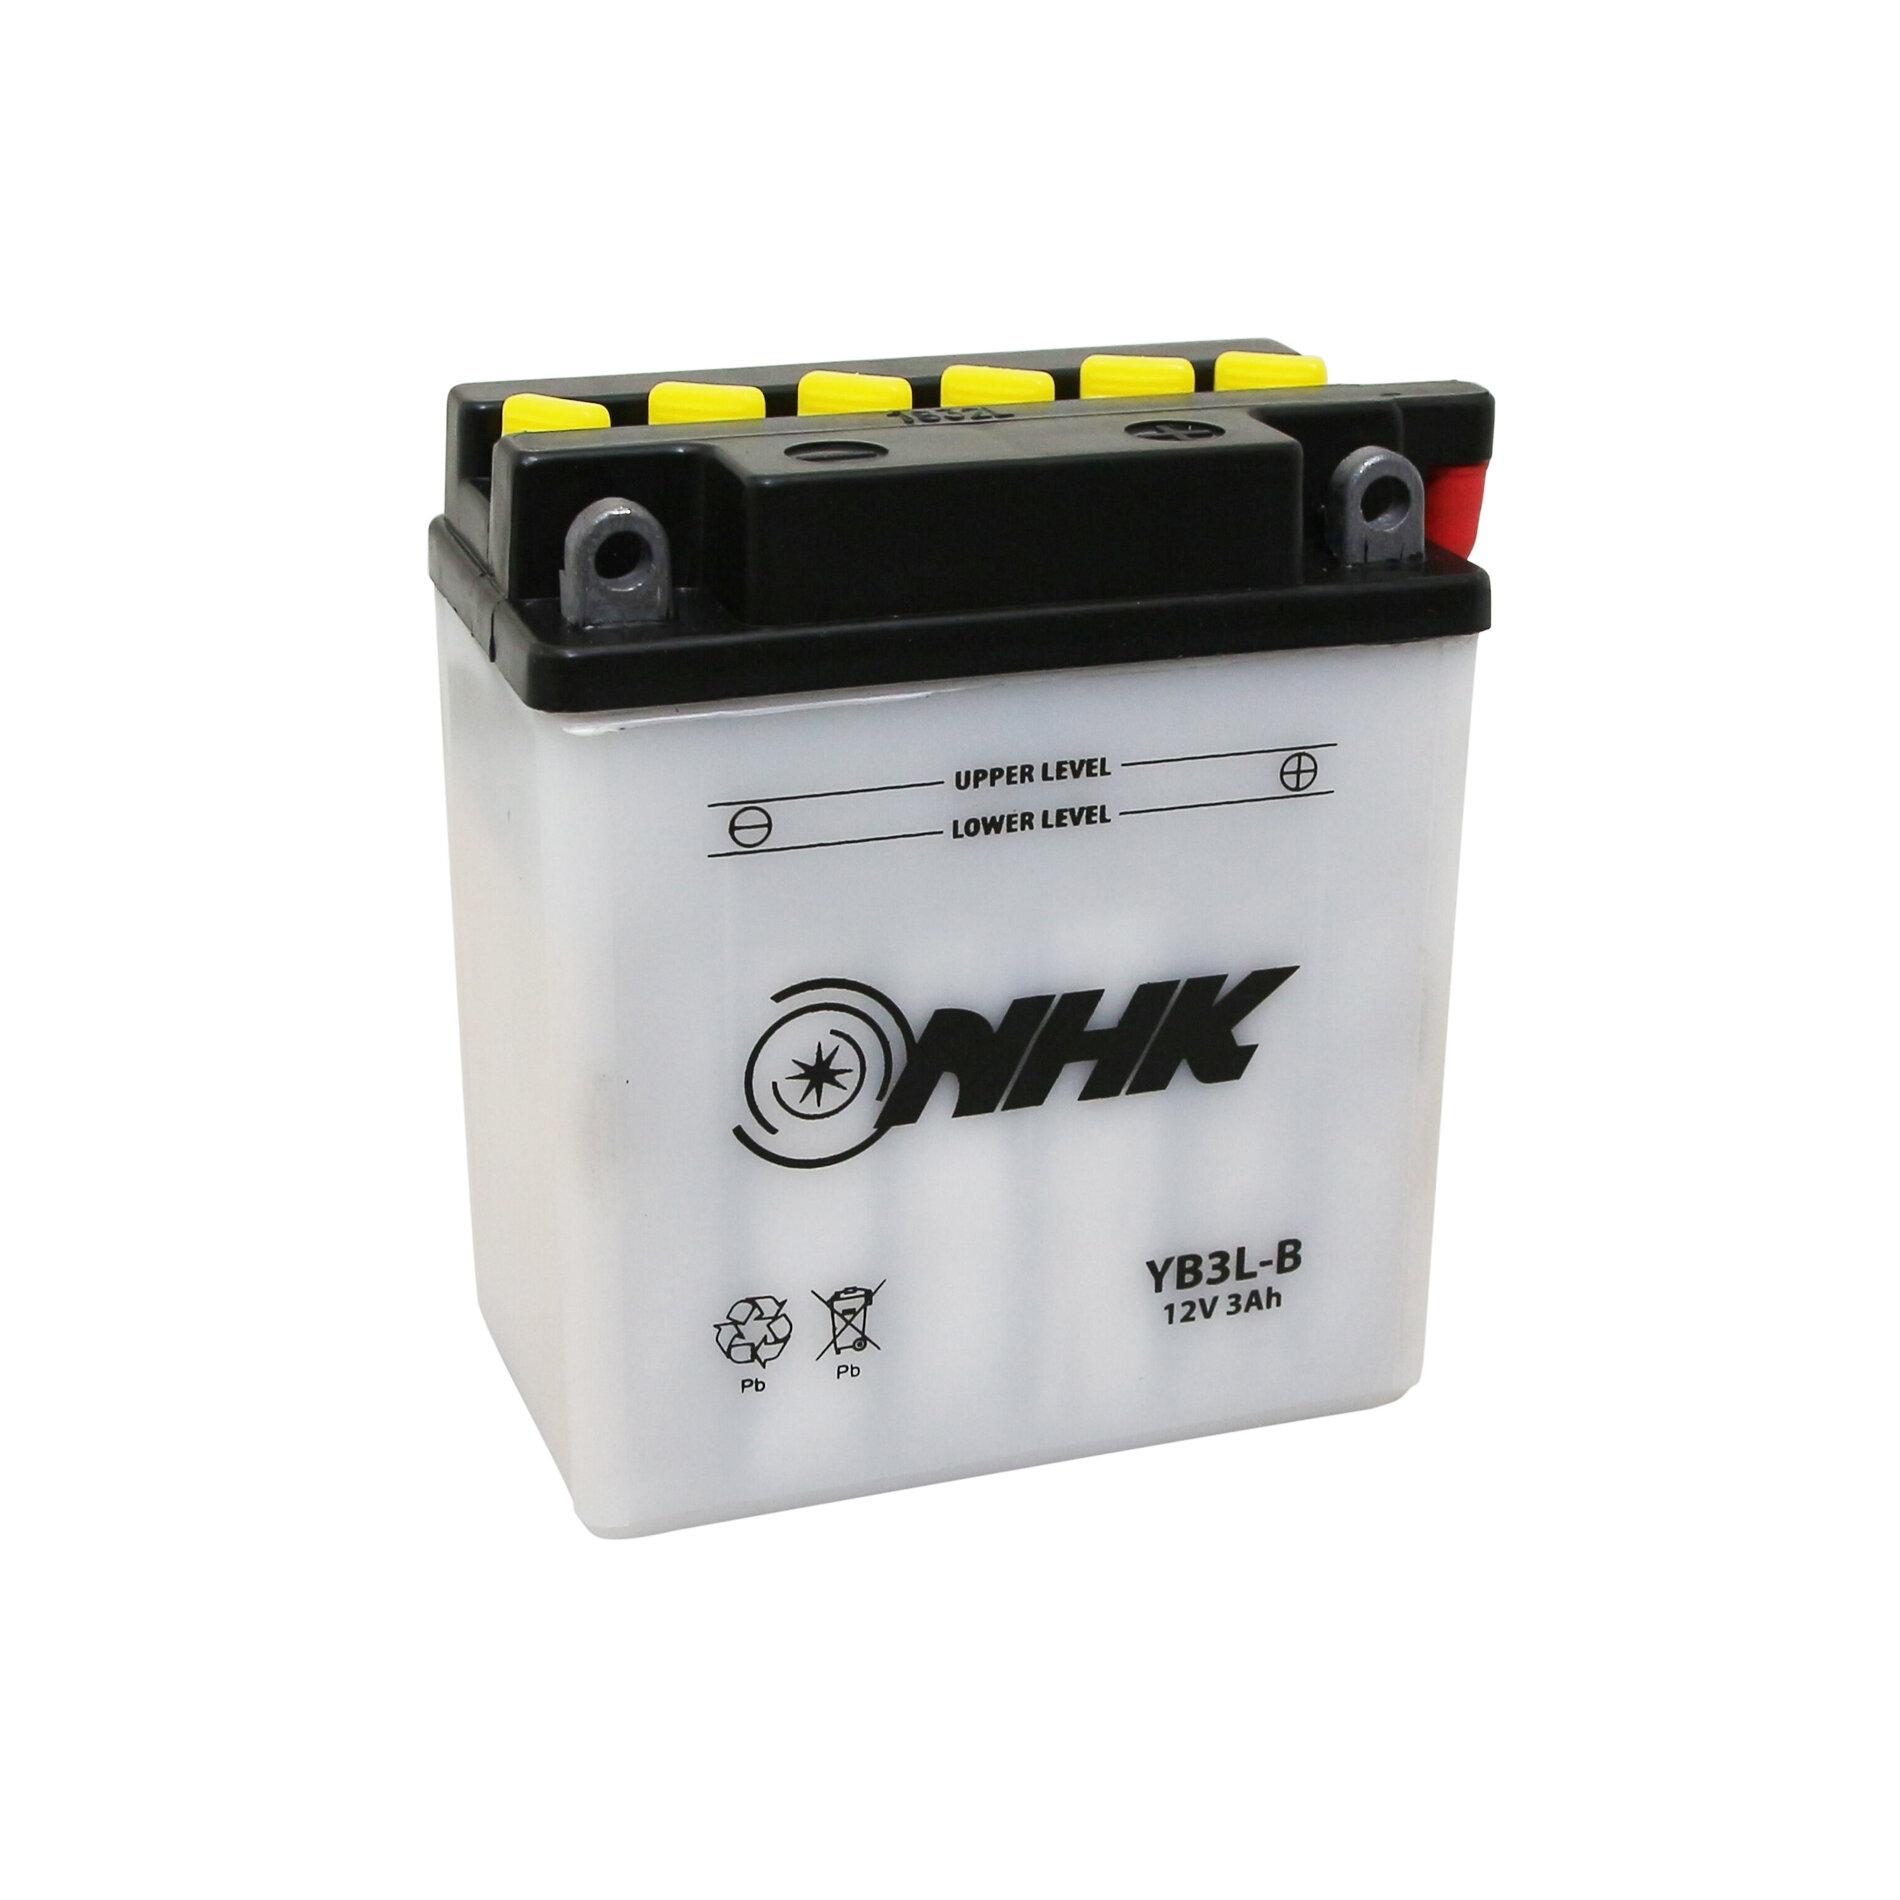 Batterie NHK YB3L-B 12V 3Ah avec entretien